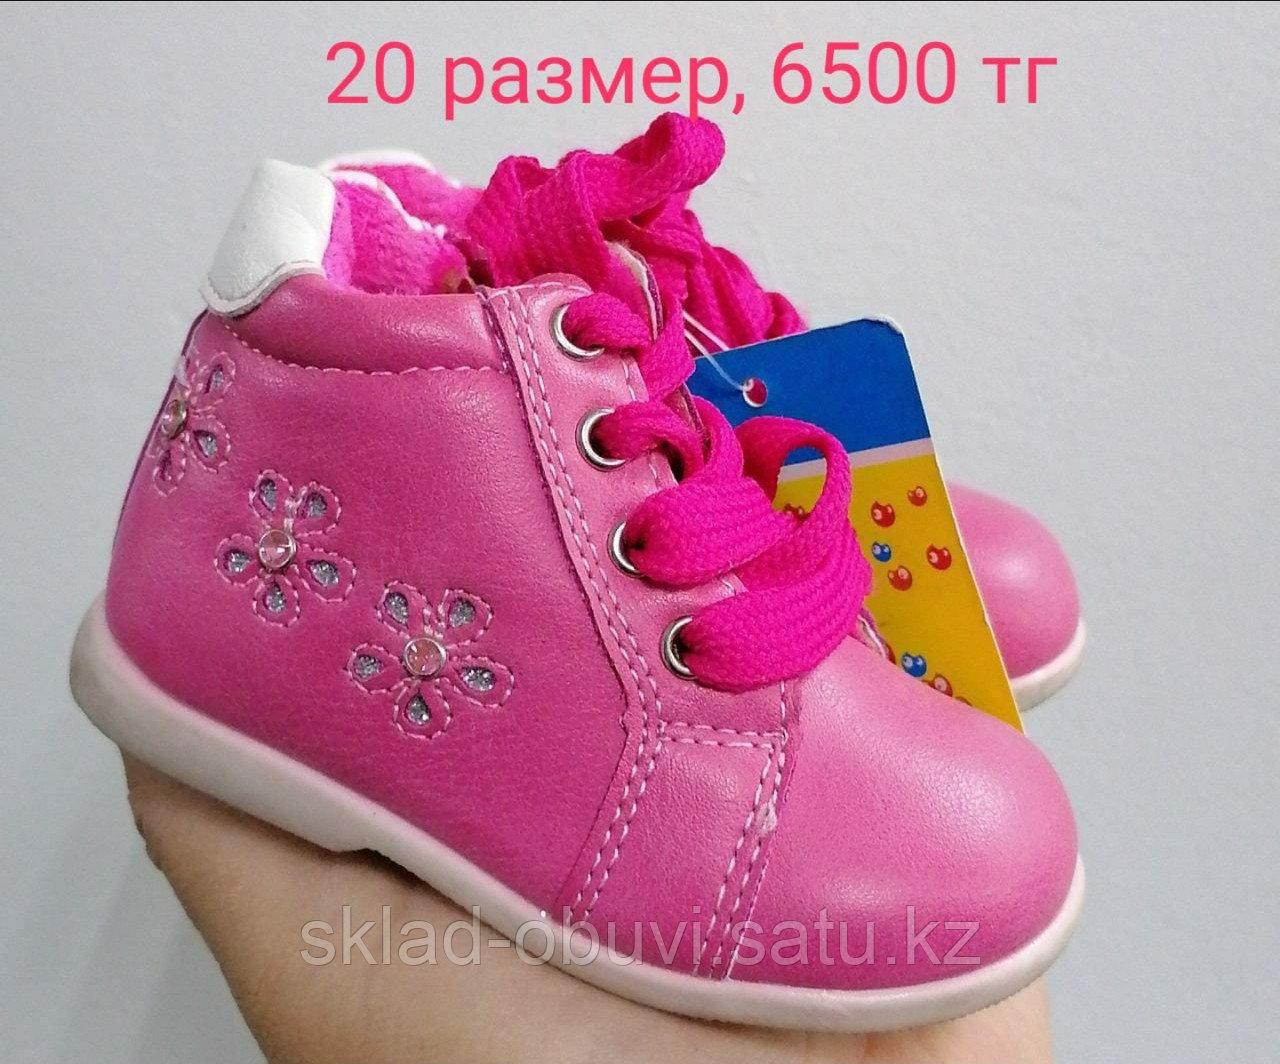 Flamingo. Ботинки детям. - фото 2